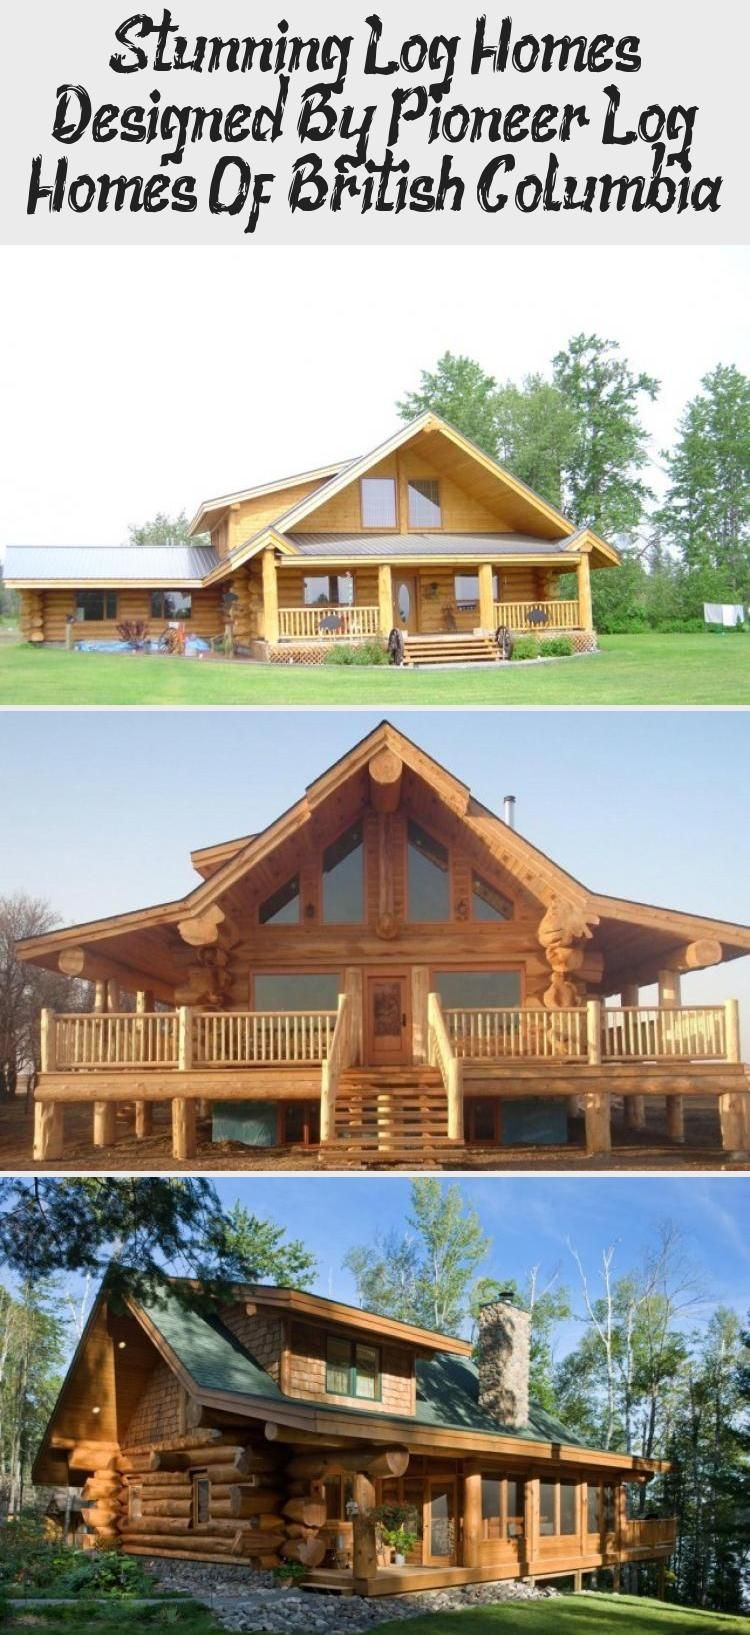 Most Recent Snap Shots Pioneer Log Homes Tips In 2020 Log Home Designs Log Homes House Design